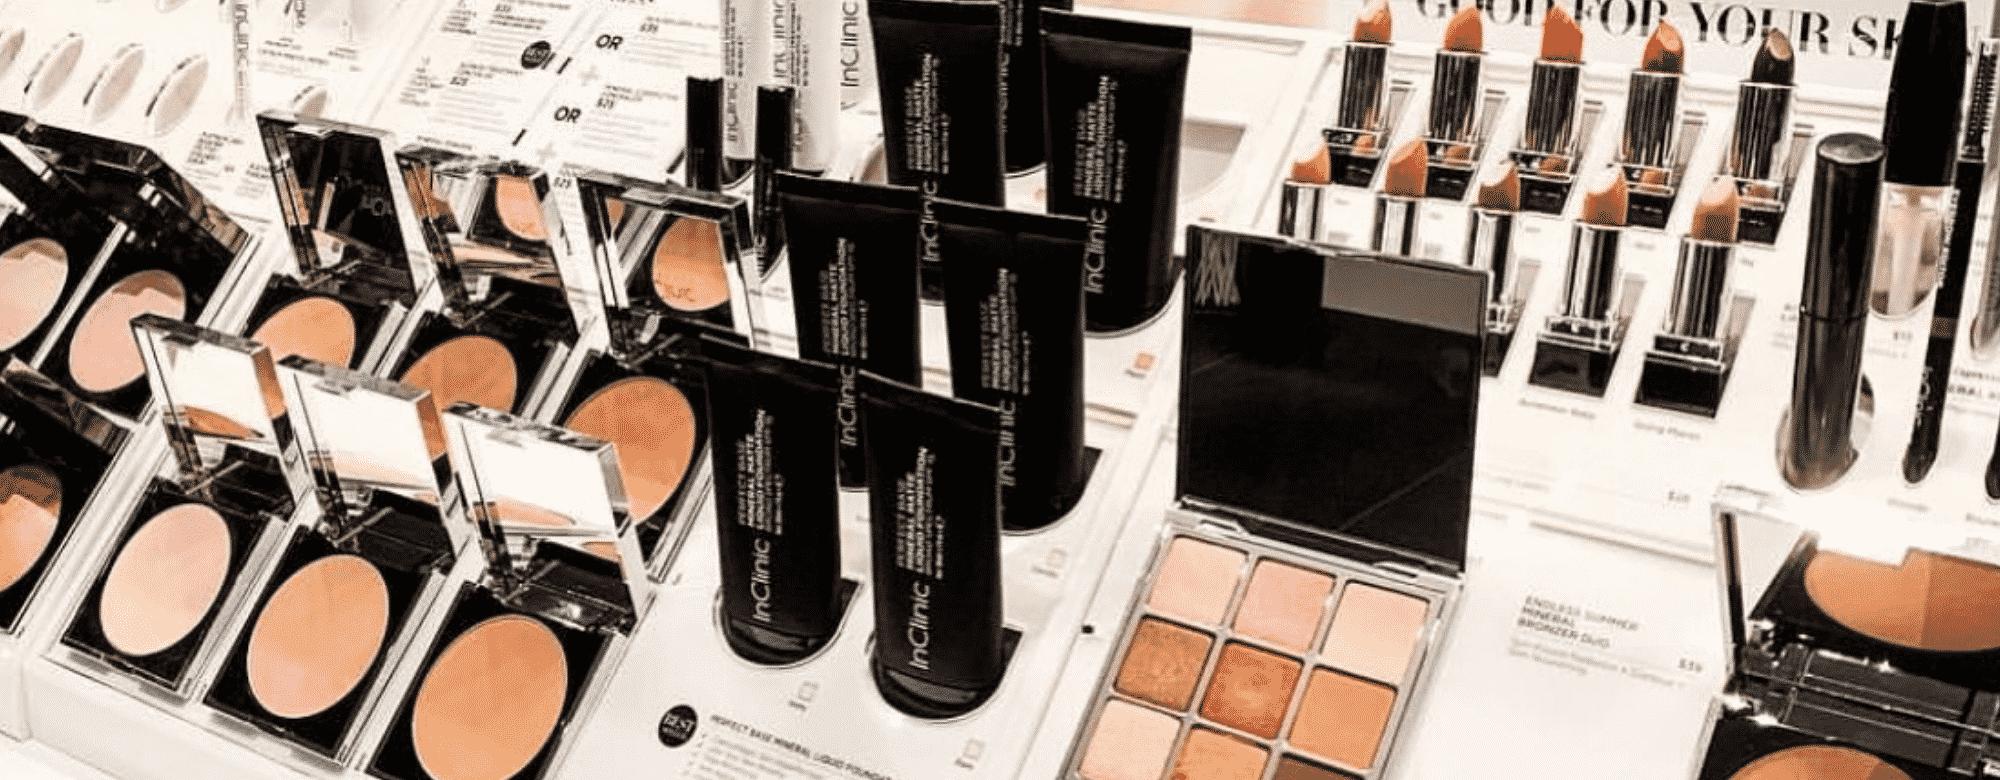 minerale make-up hasselt